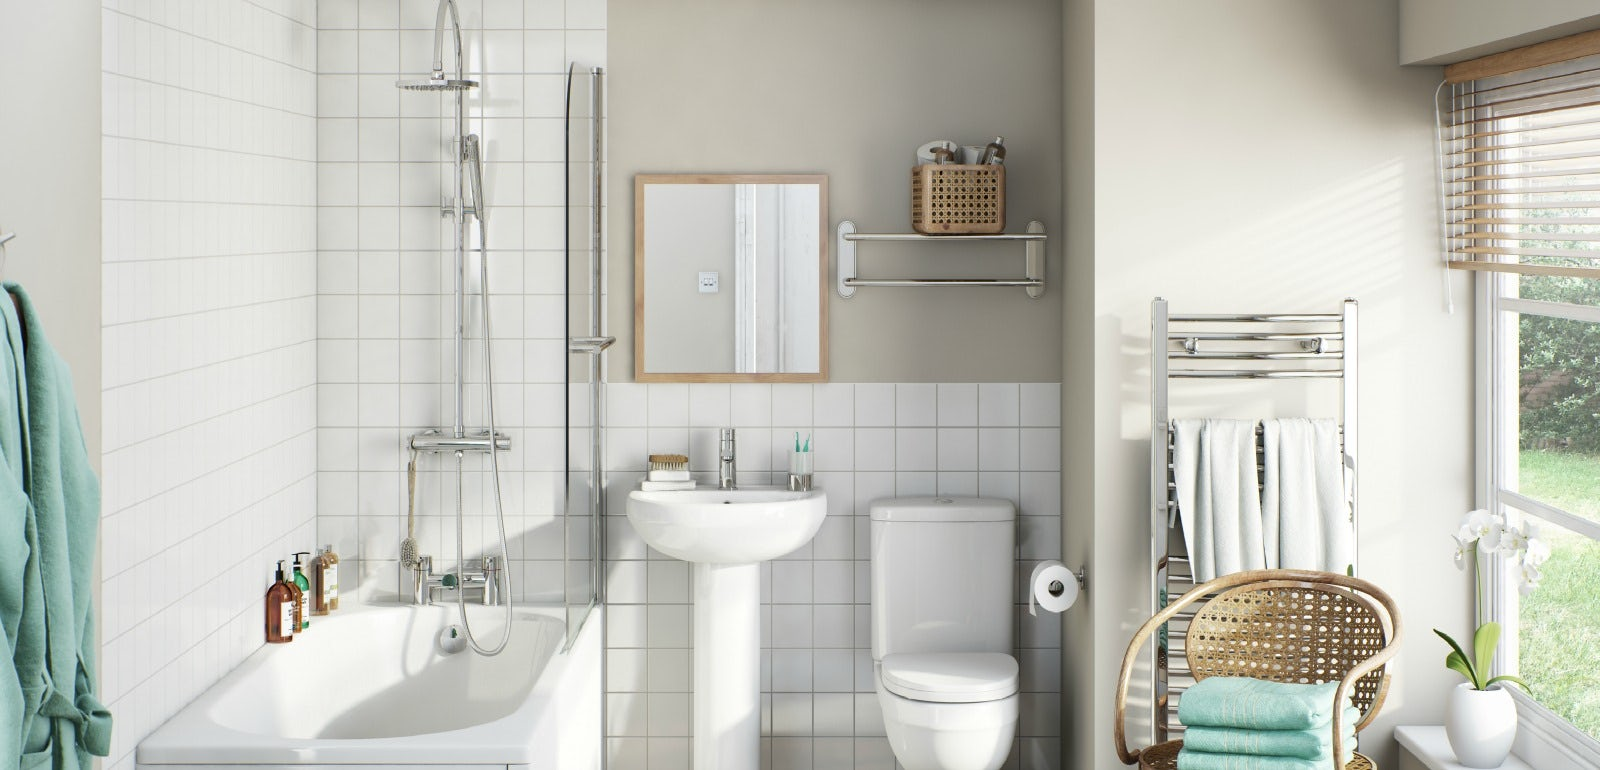 Planning a family bathroom